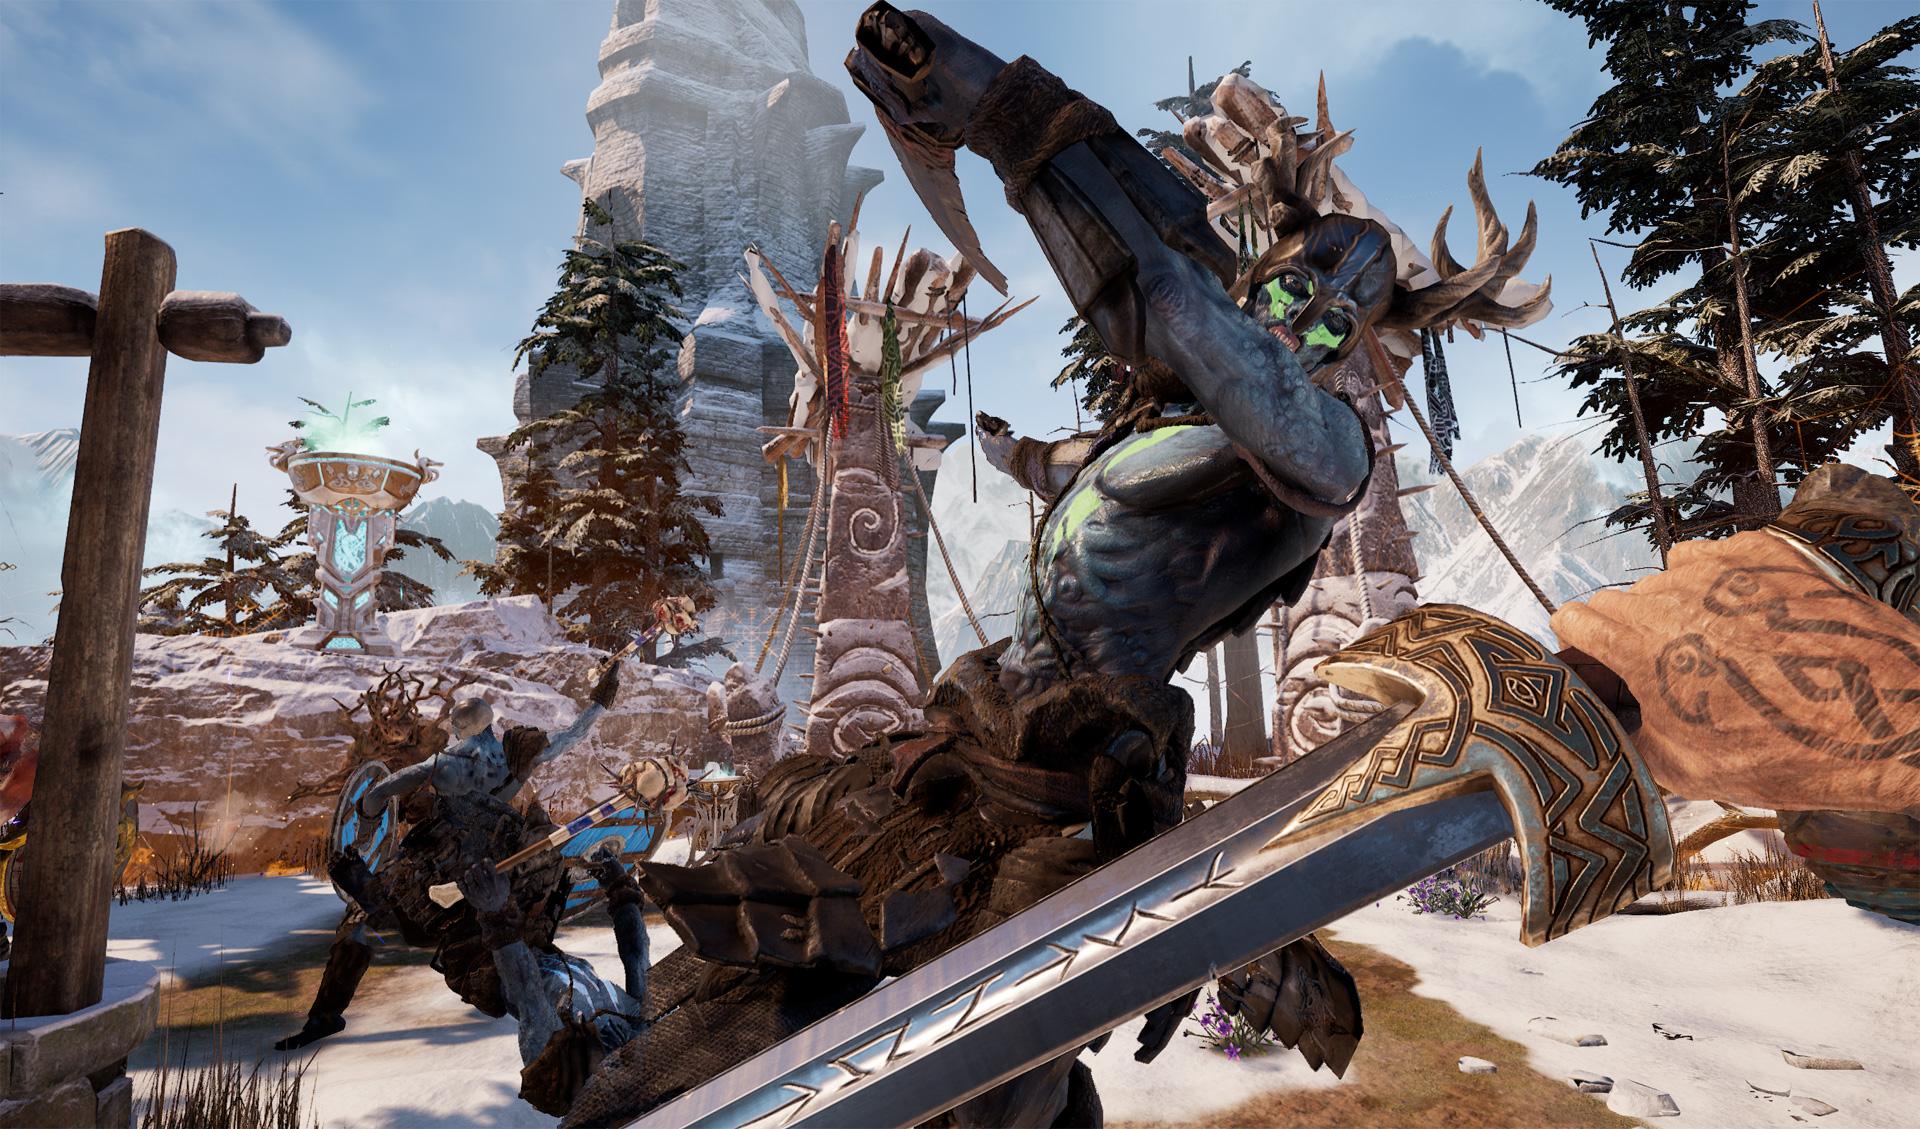 Asgard's Wrath is a 30-hour mythological action-RPG romp for Oculus Rift screenshot